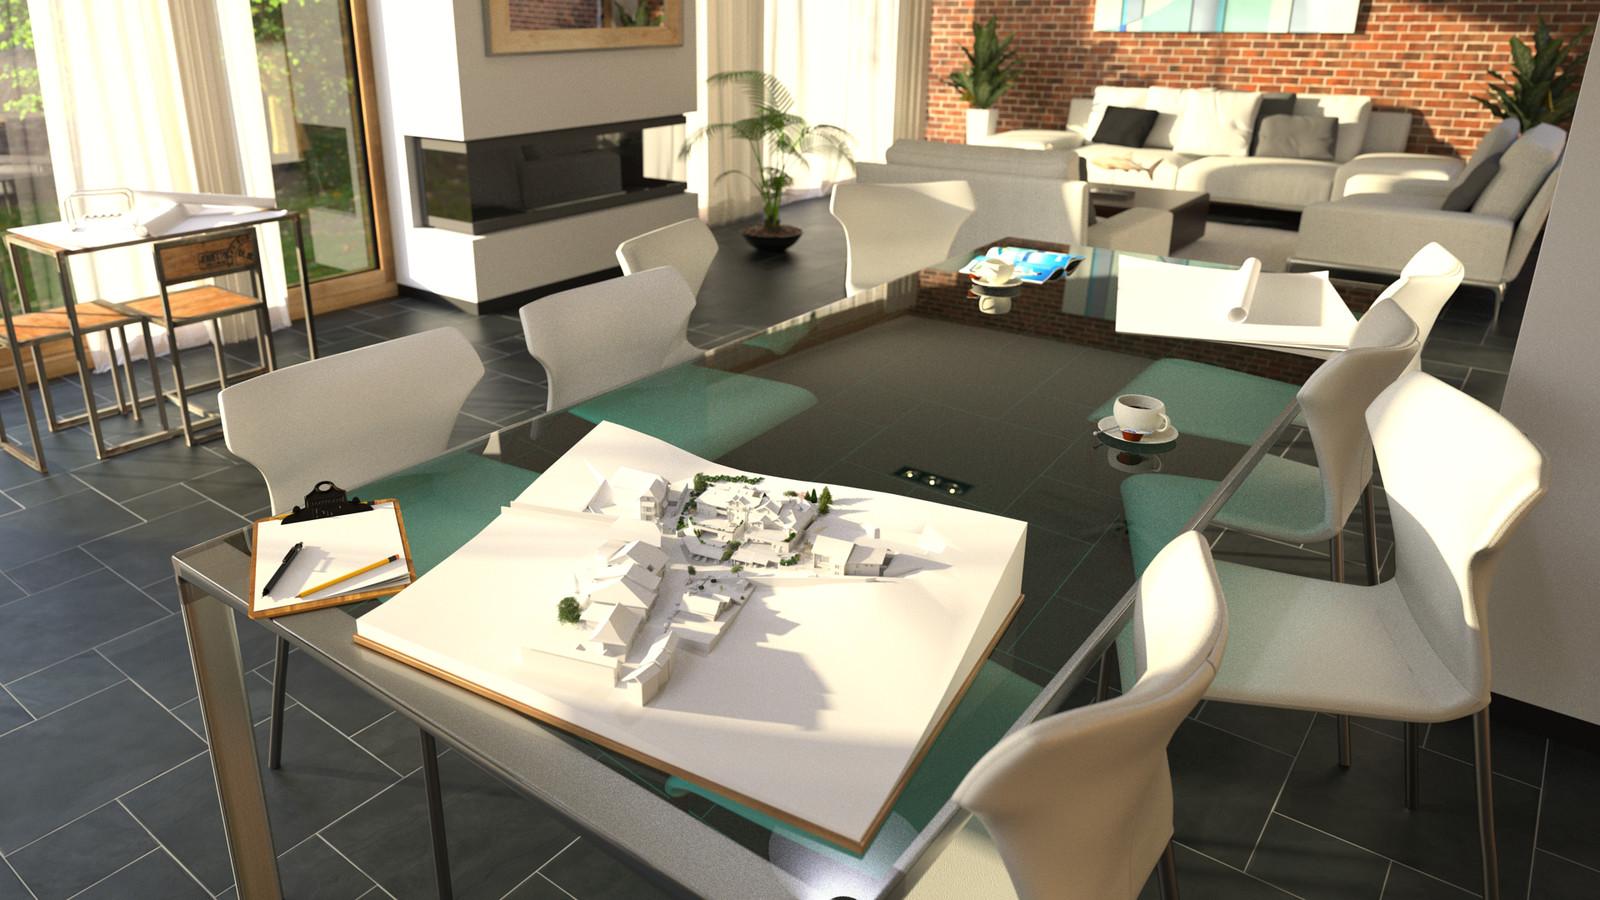 14 Scene New Thea 02   Read more: http://www.kemppro.com/KP_3D_communication-table_architect.htmlDOFC